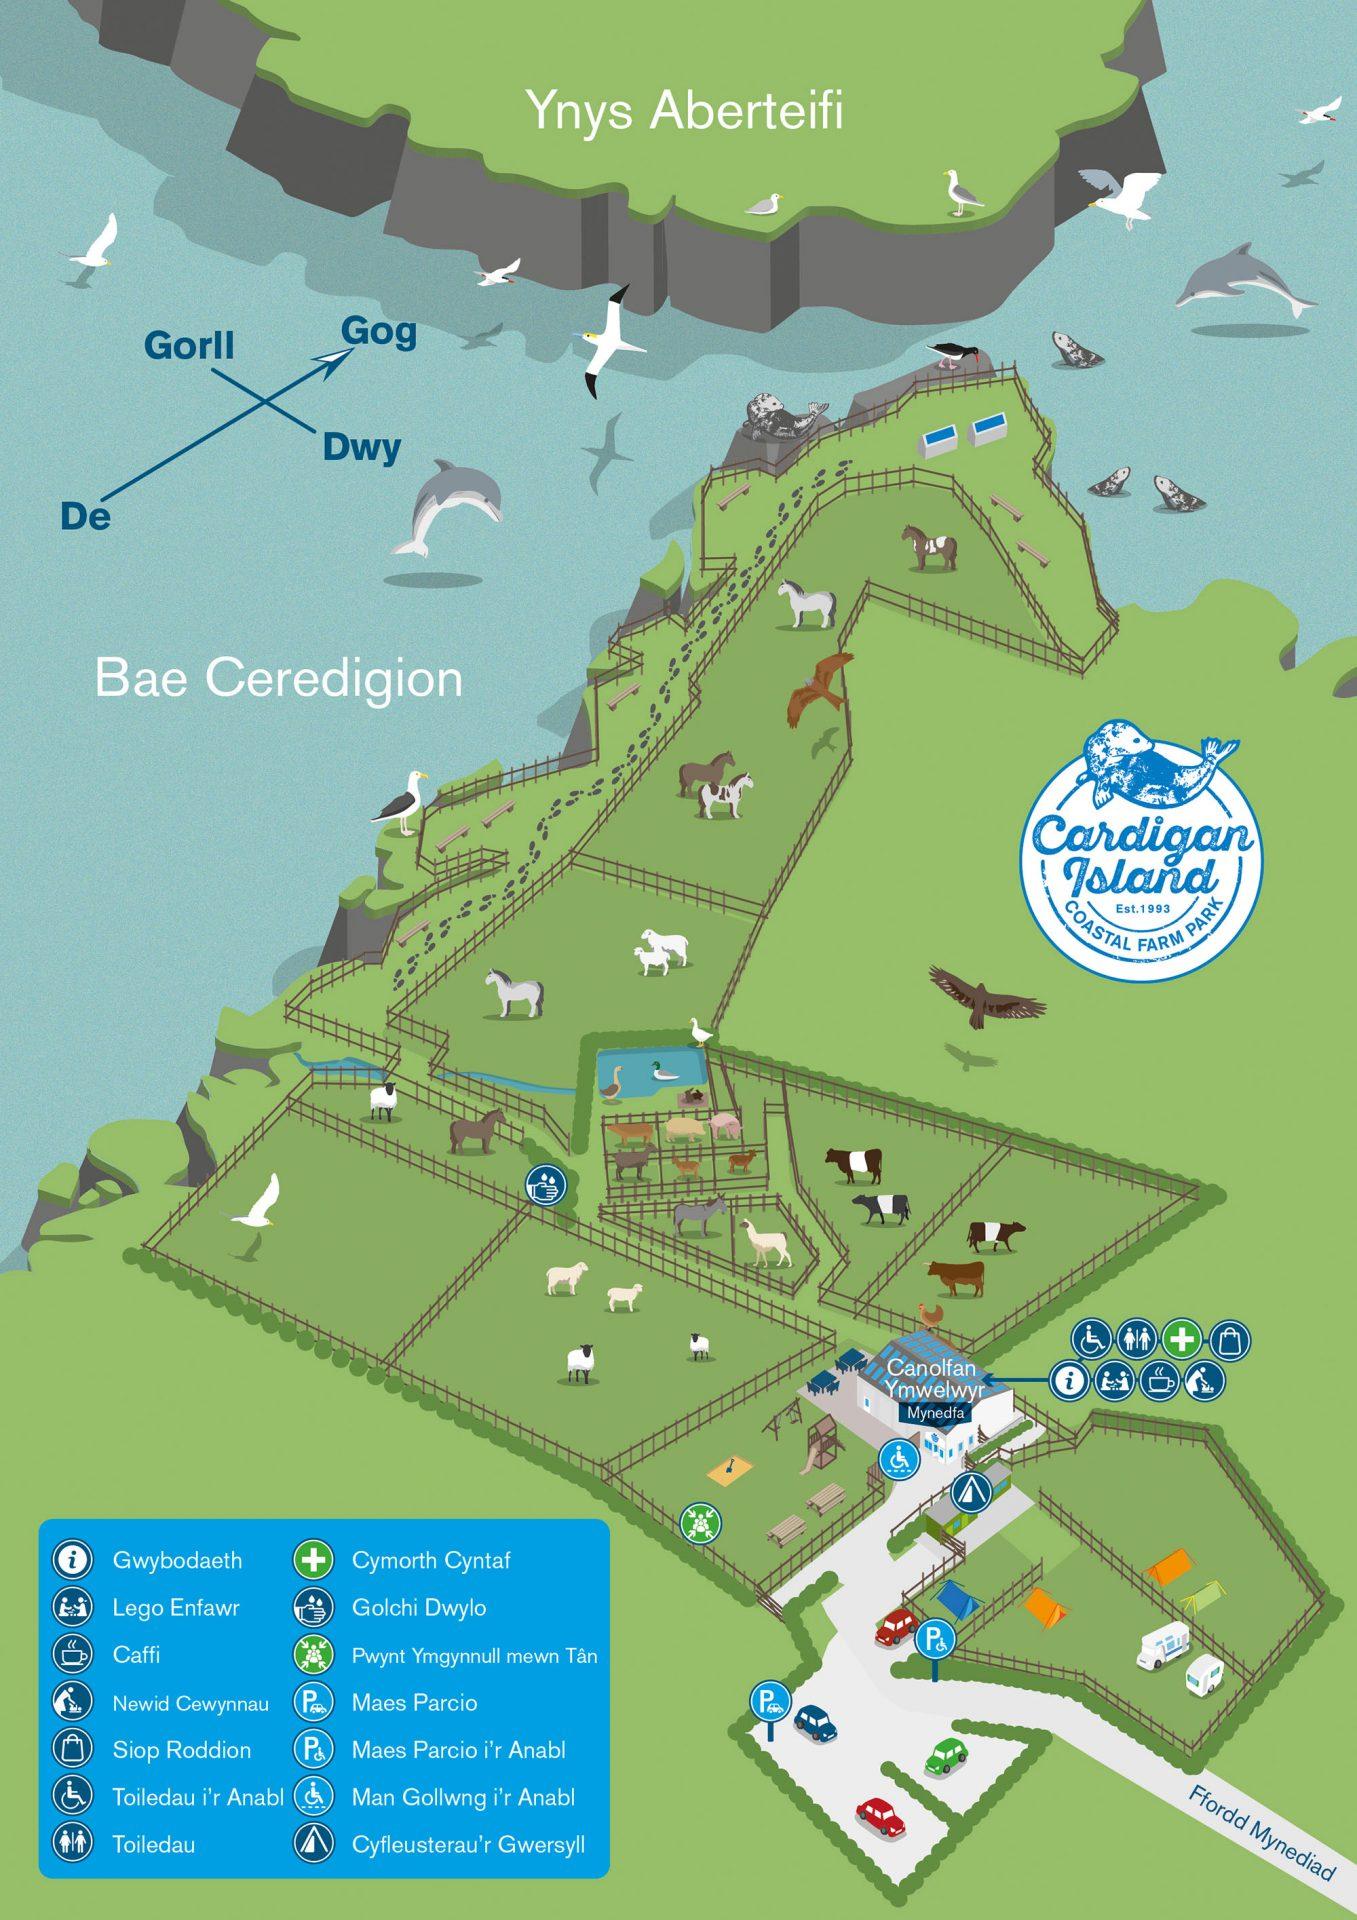 cardigan-island-map